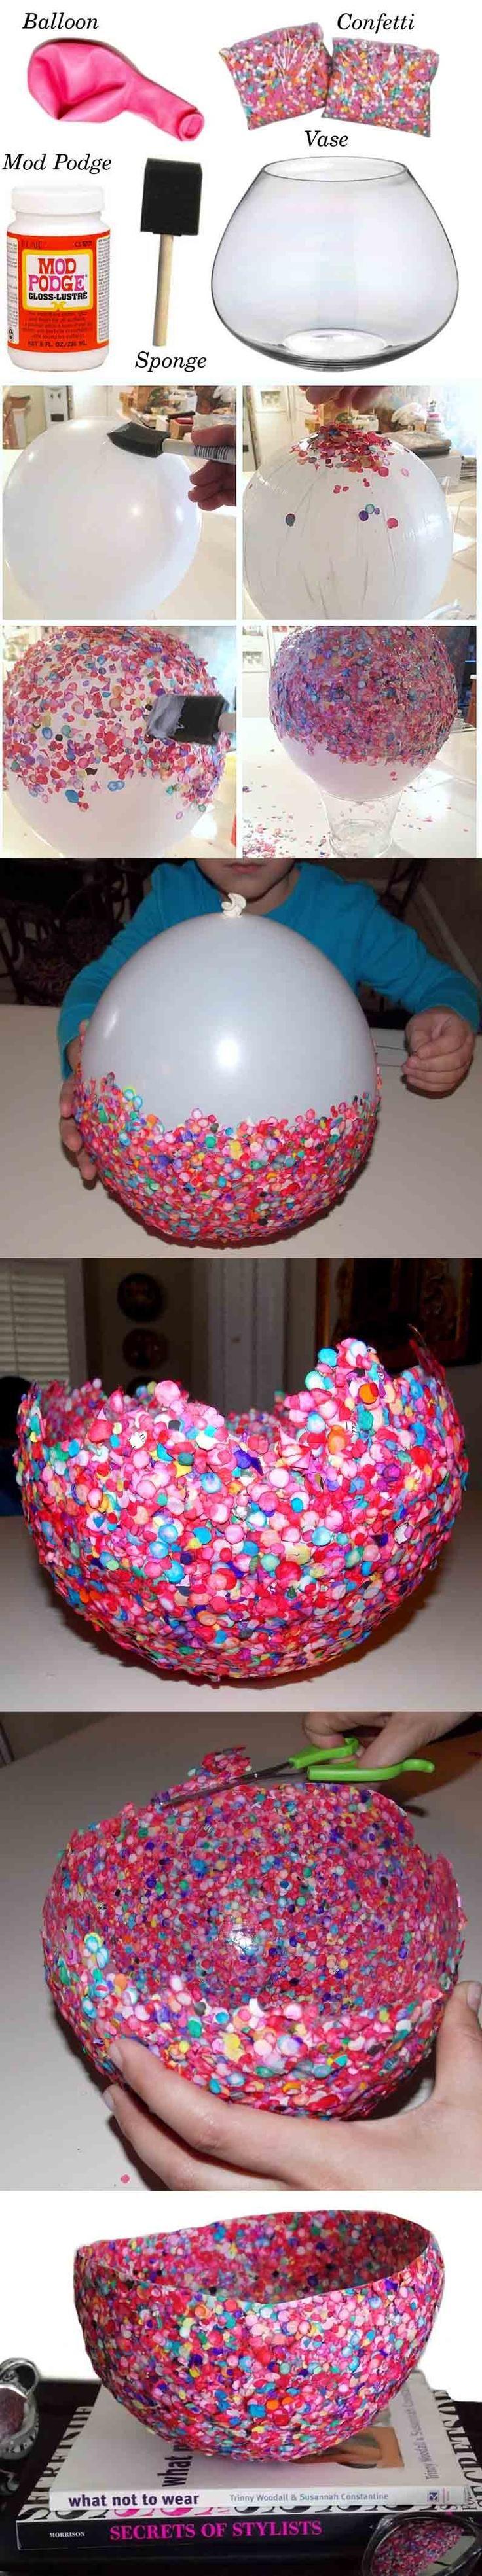 Confetti and Mod Podge balloon bowls